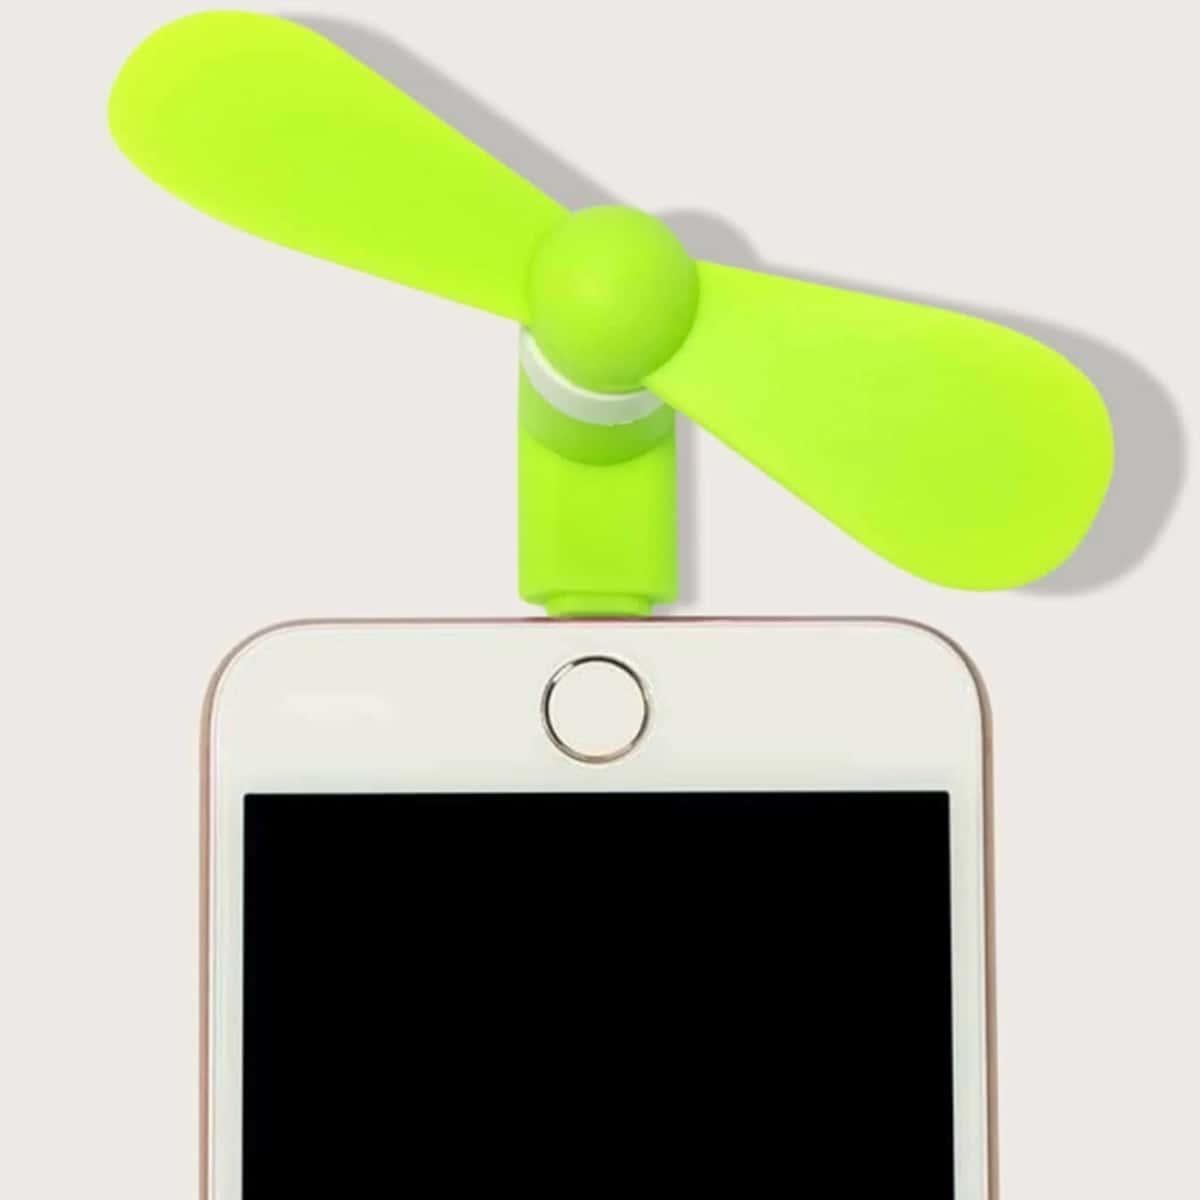 Мини вентилятор для iPhone 1шт